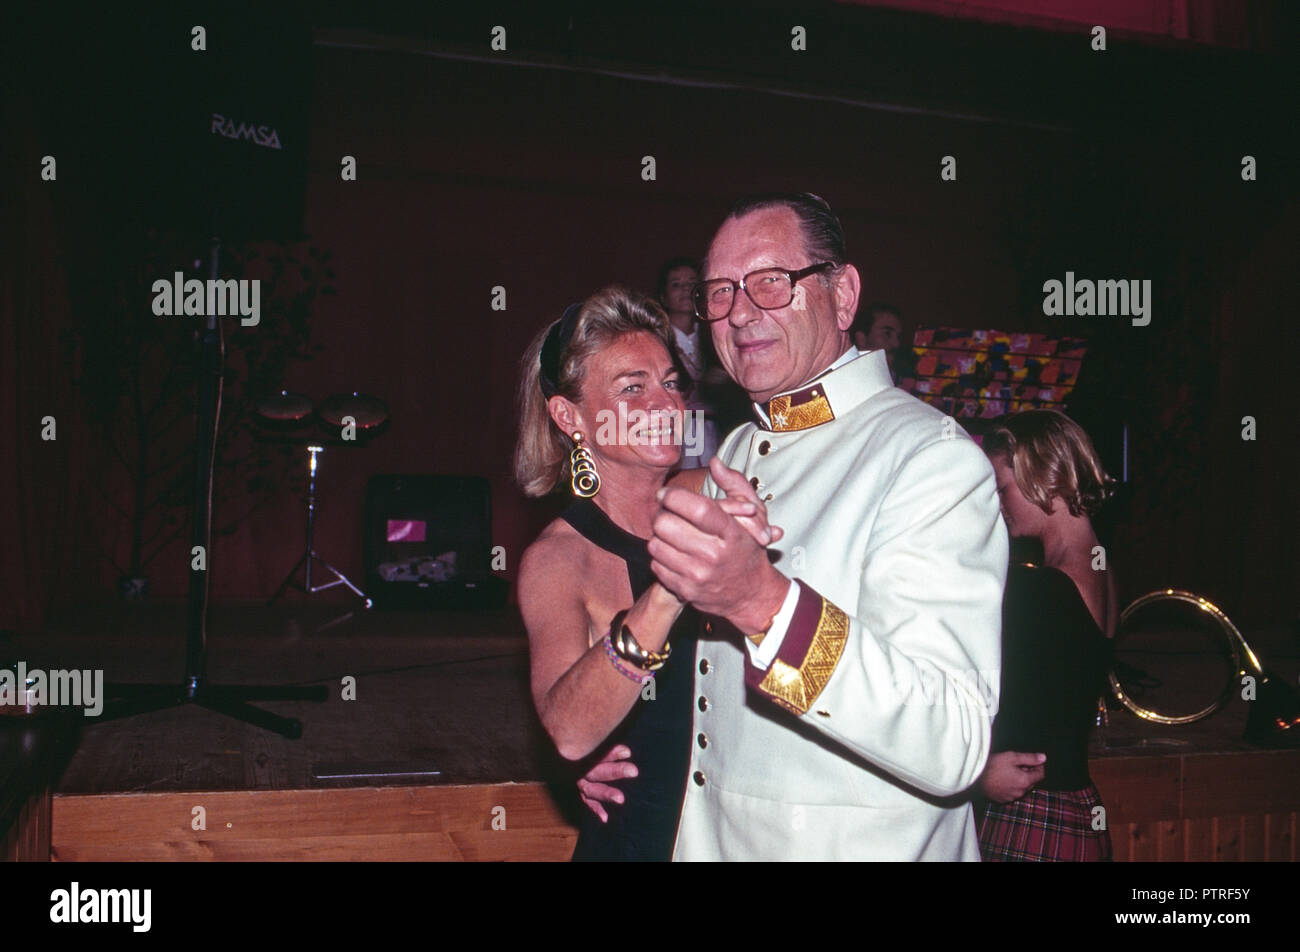 Dieter Baron Malsen Ponickau mit Baroness Sybille de Selys Longchamps in Schloss Osterberg, Deutschland 1998. Baron Dieter von Malsen Ponickau mit Baroness Sybille de Selys Longchamps am Osterberg schloss, Deutschland 1998. Stockfoto